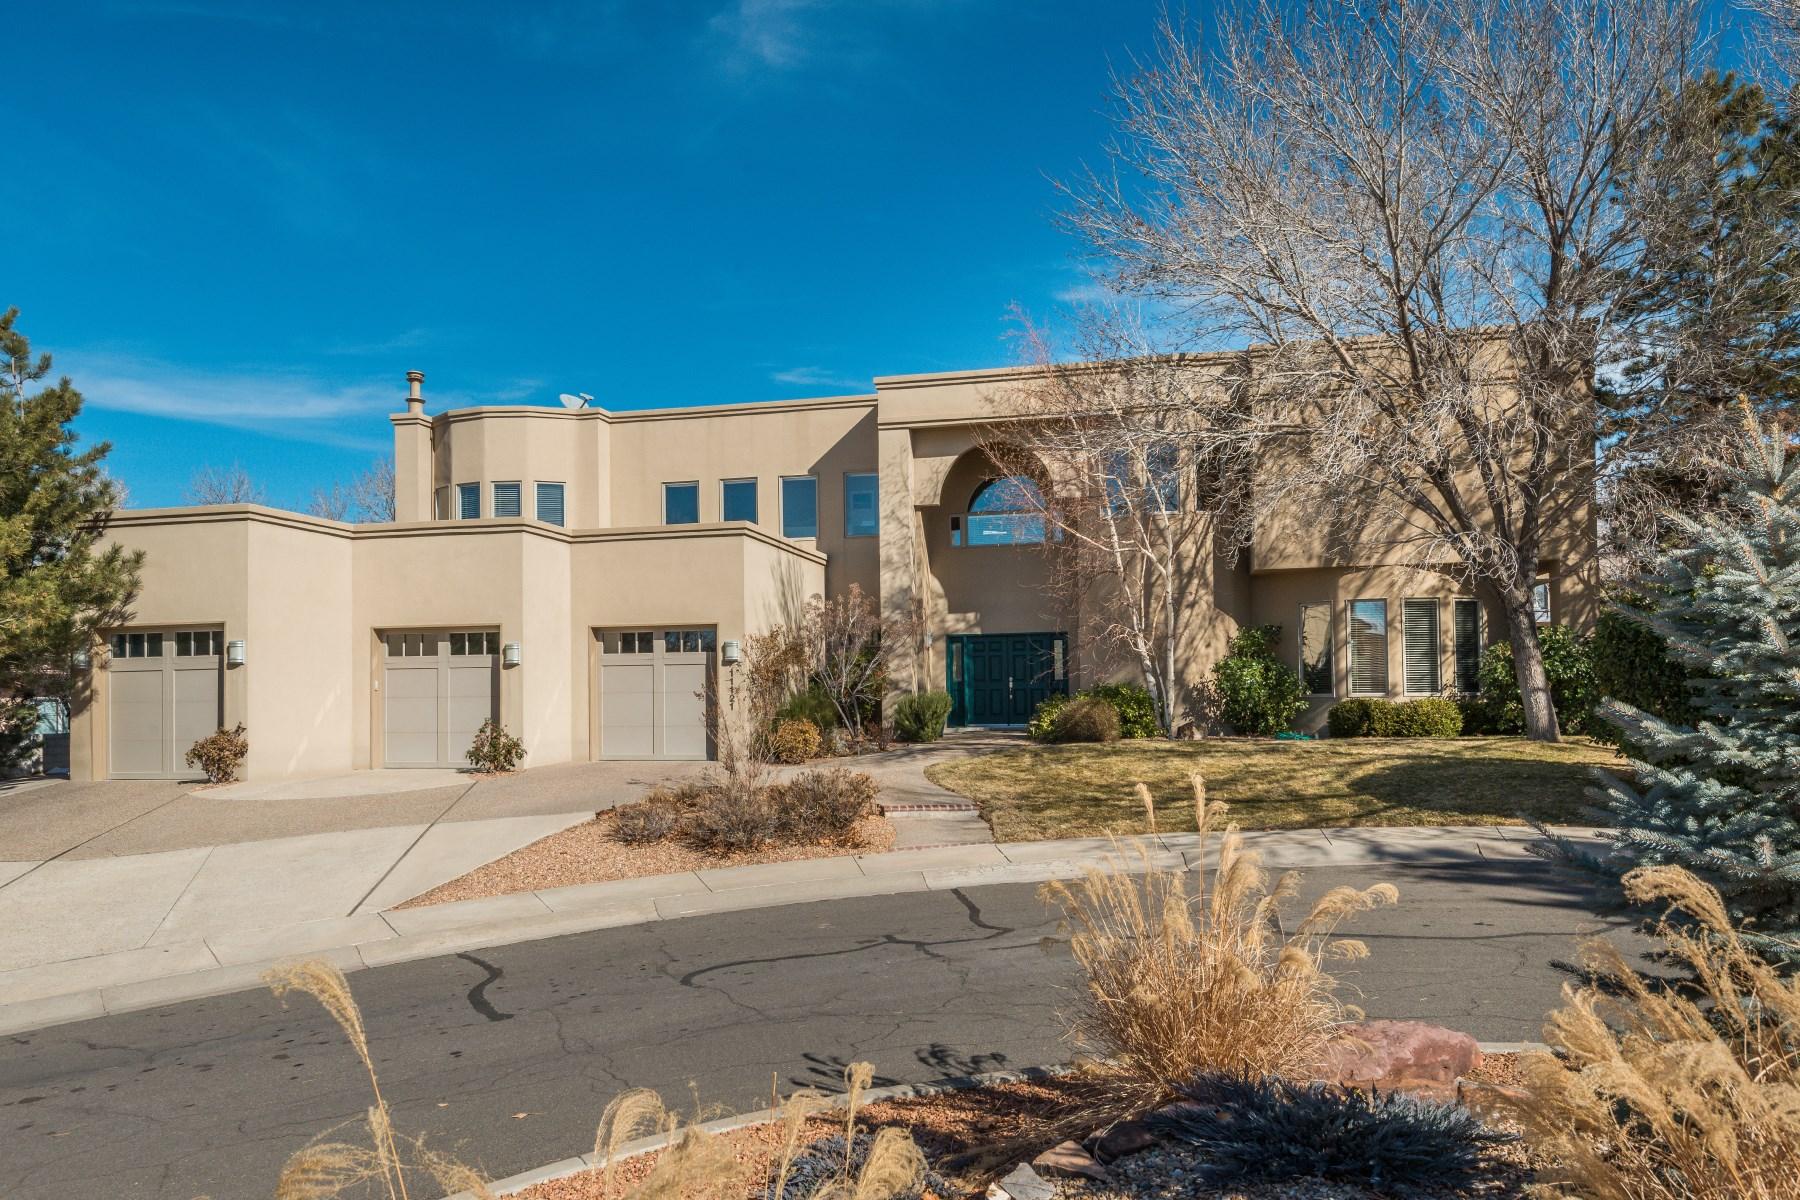 Nhà ở một gia đình vì Bán tại 11121 Double Eagle NE Albuquerque, New Mexico 87111 Hoa Kỳ